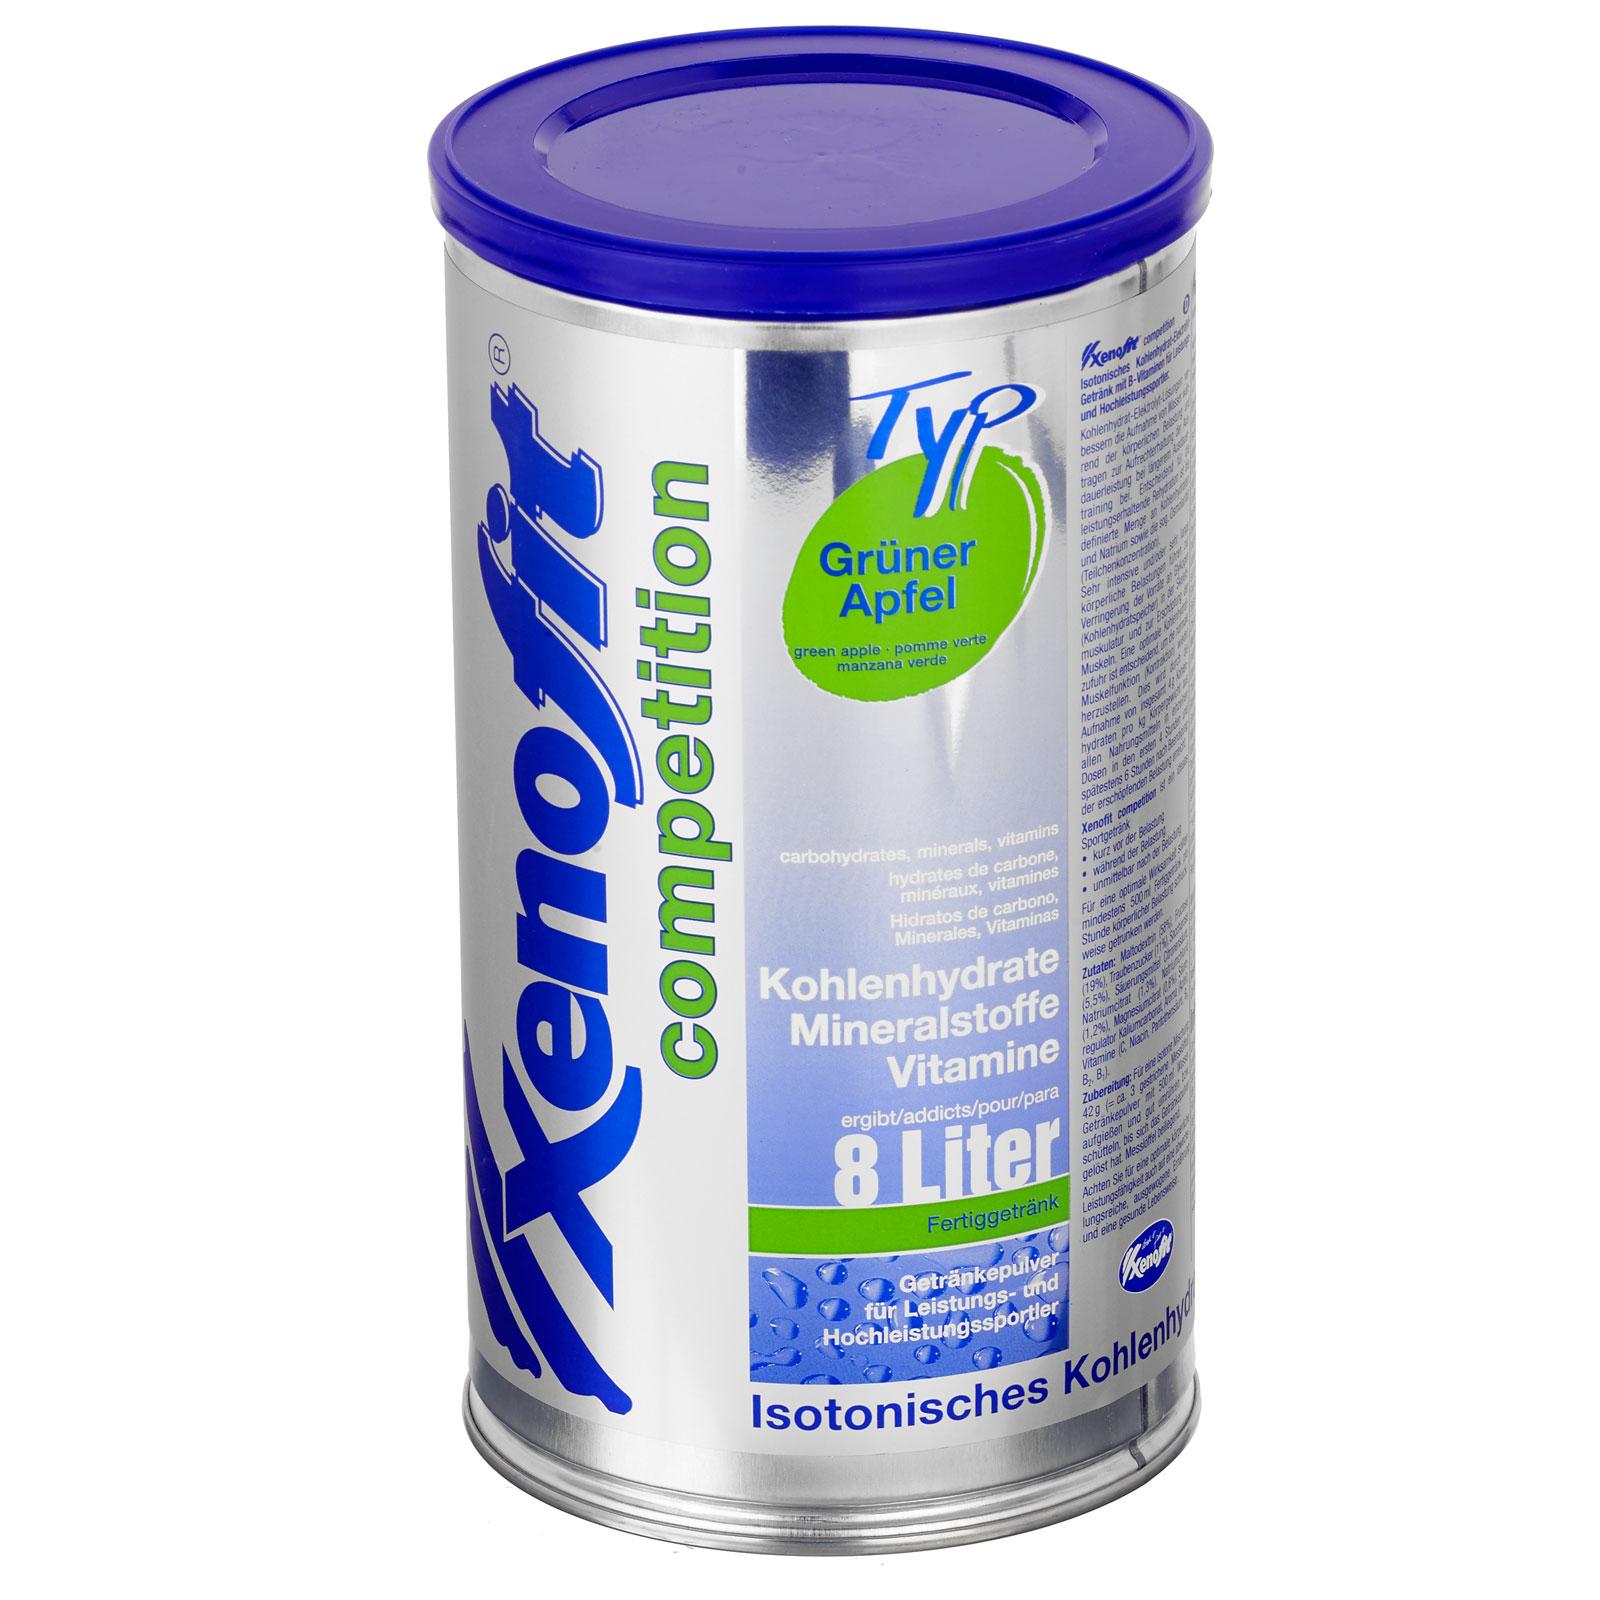 Xenofit Competition Grüner Apfel - Isotonisches Kohlenhydrat-Getränk - 672g